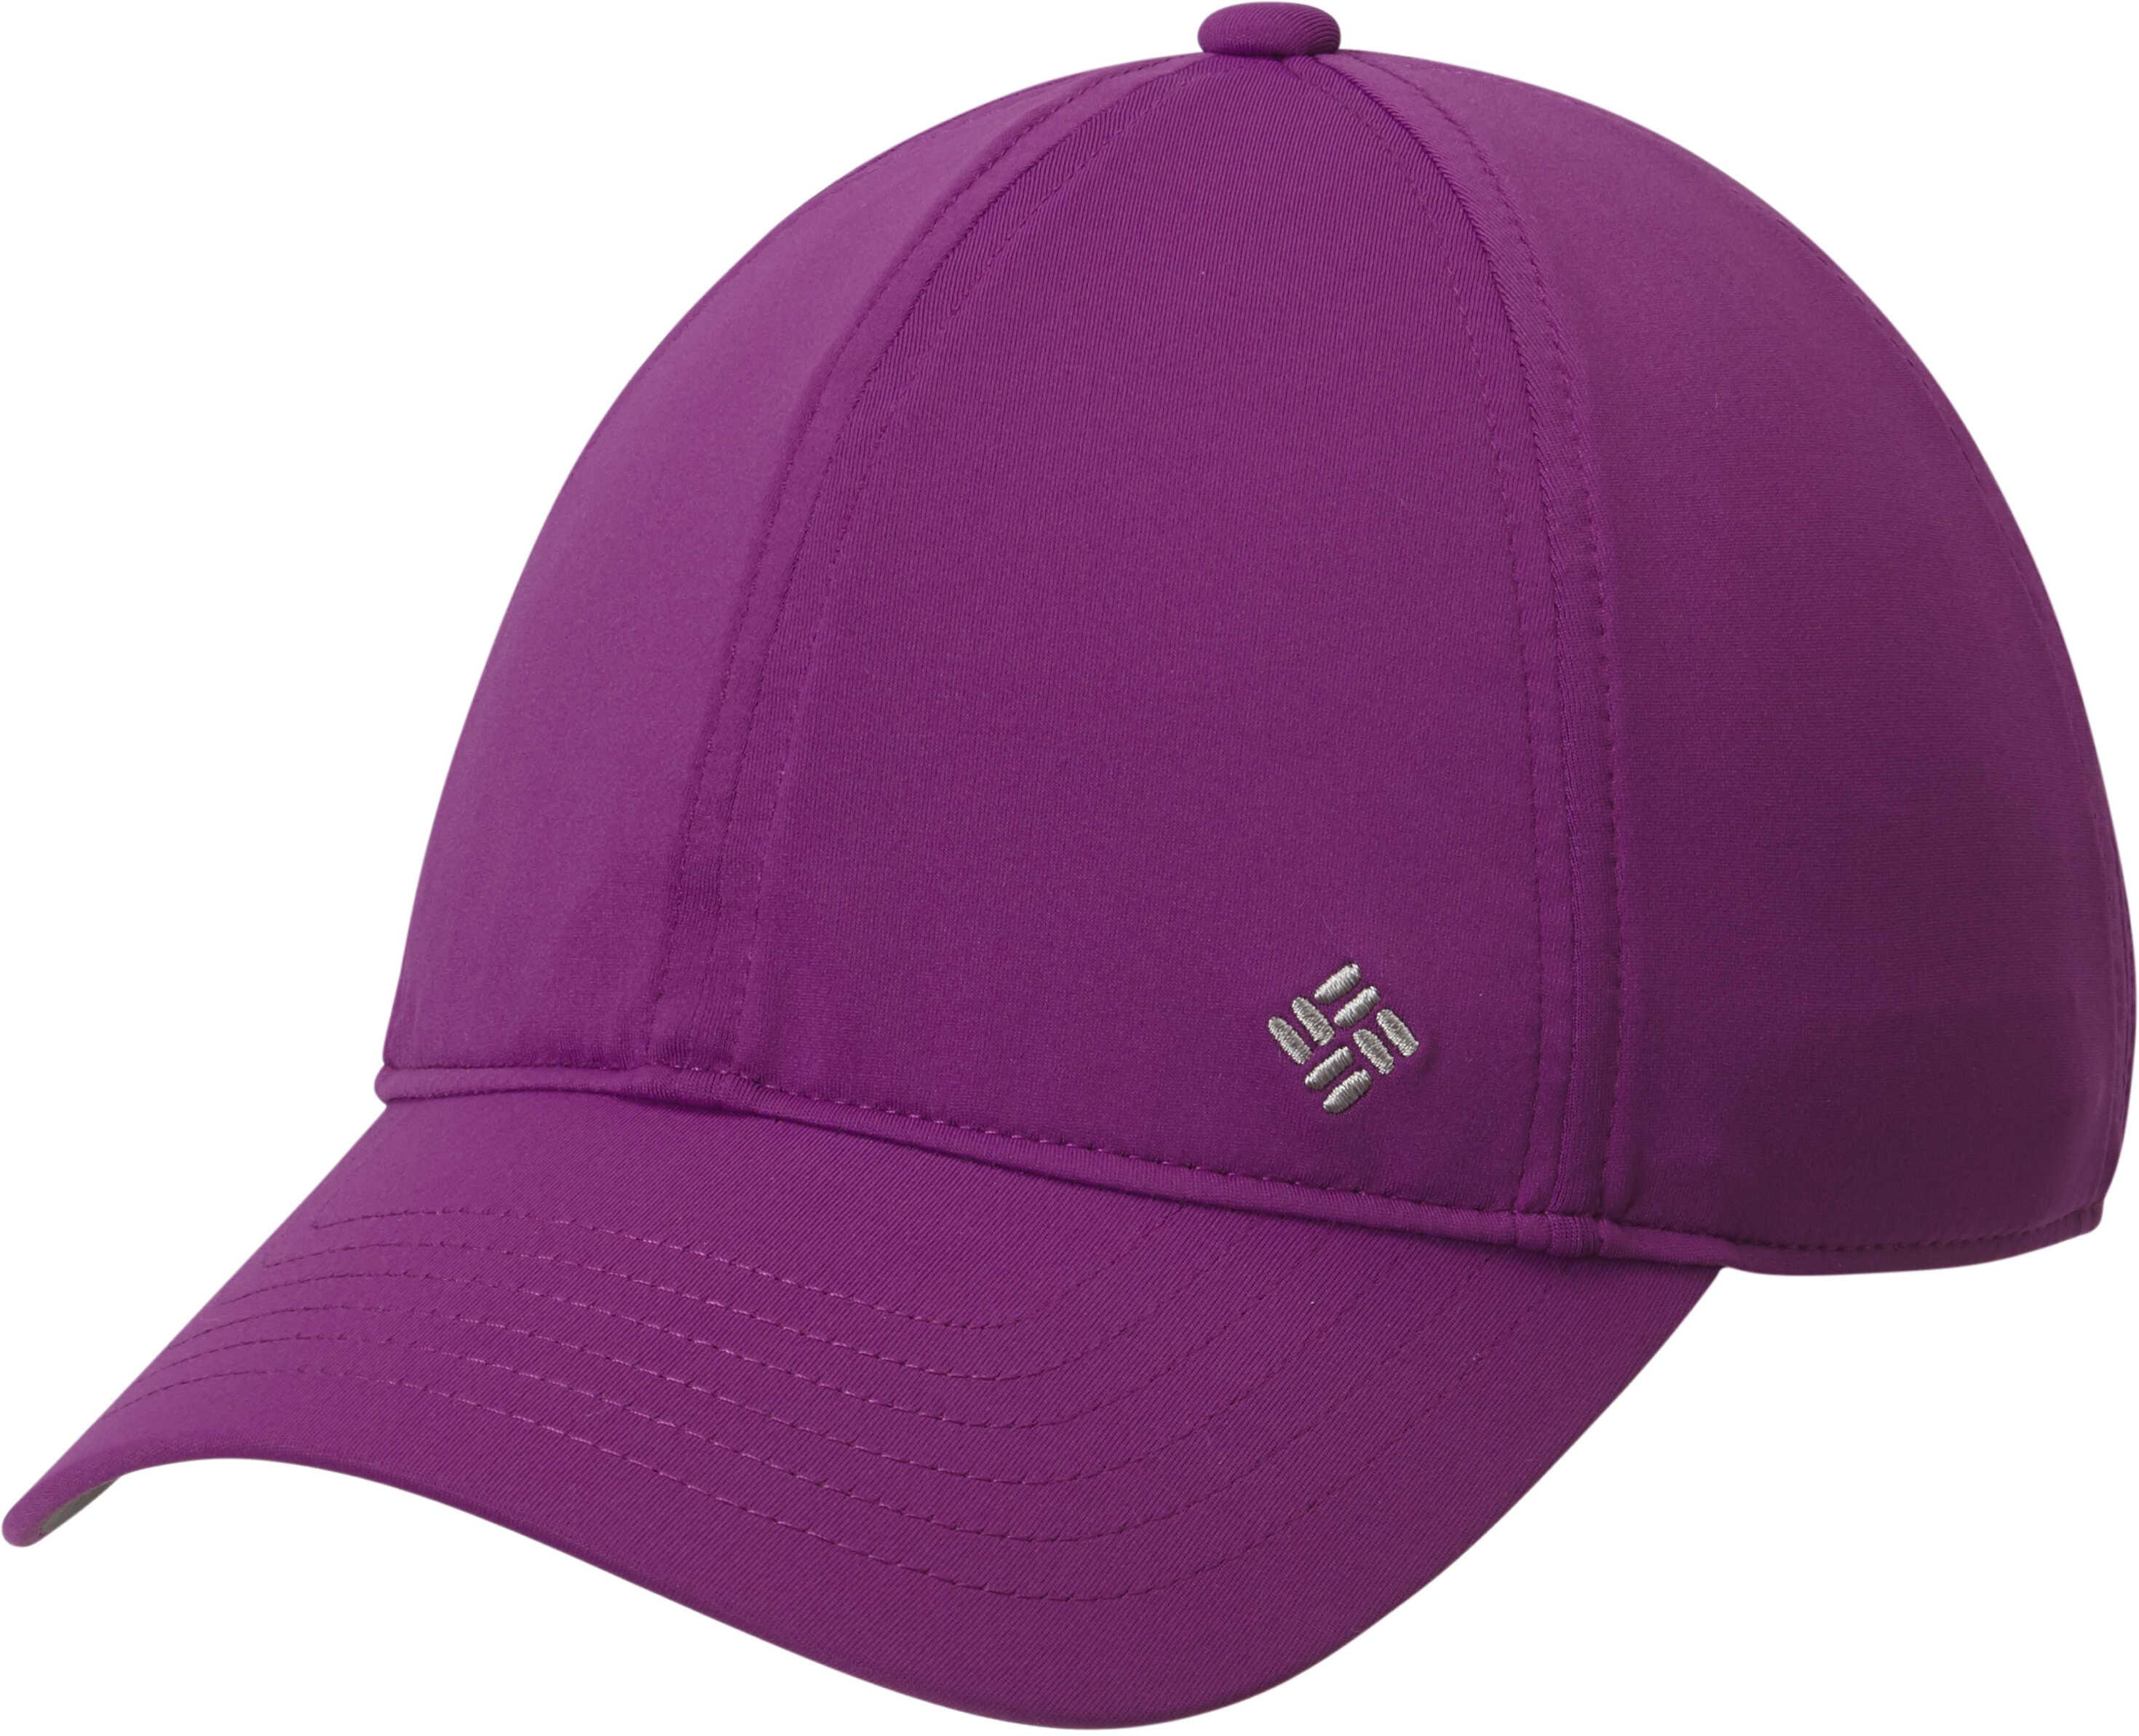 Columbia COOLHEAD Ballcap-Intense Violet Intense Violet